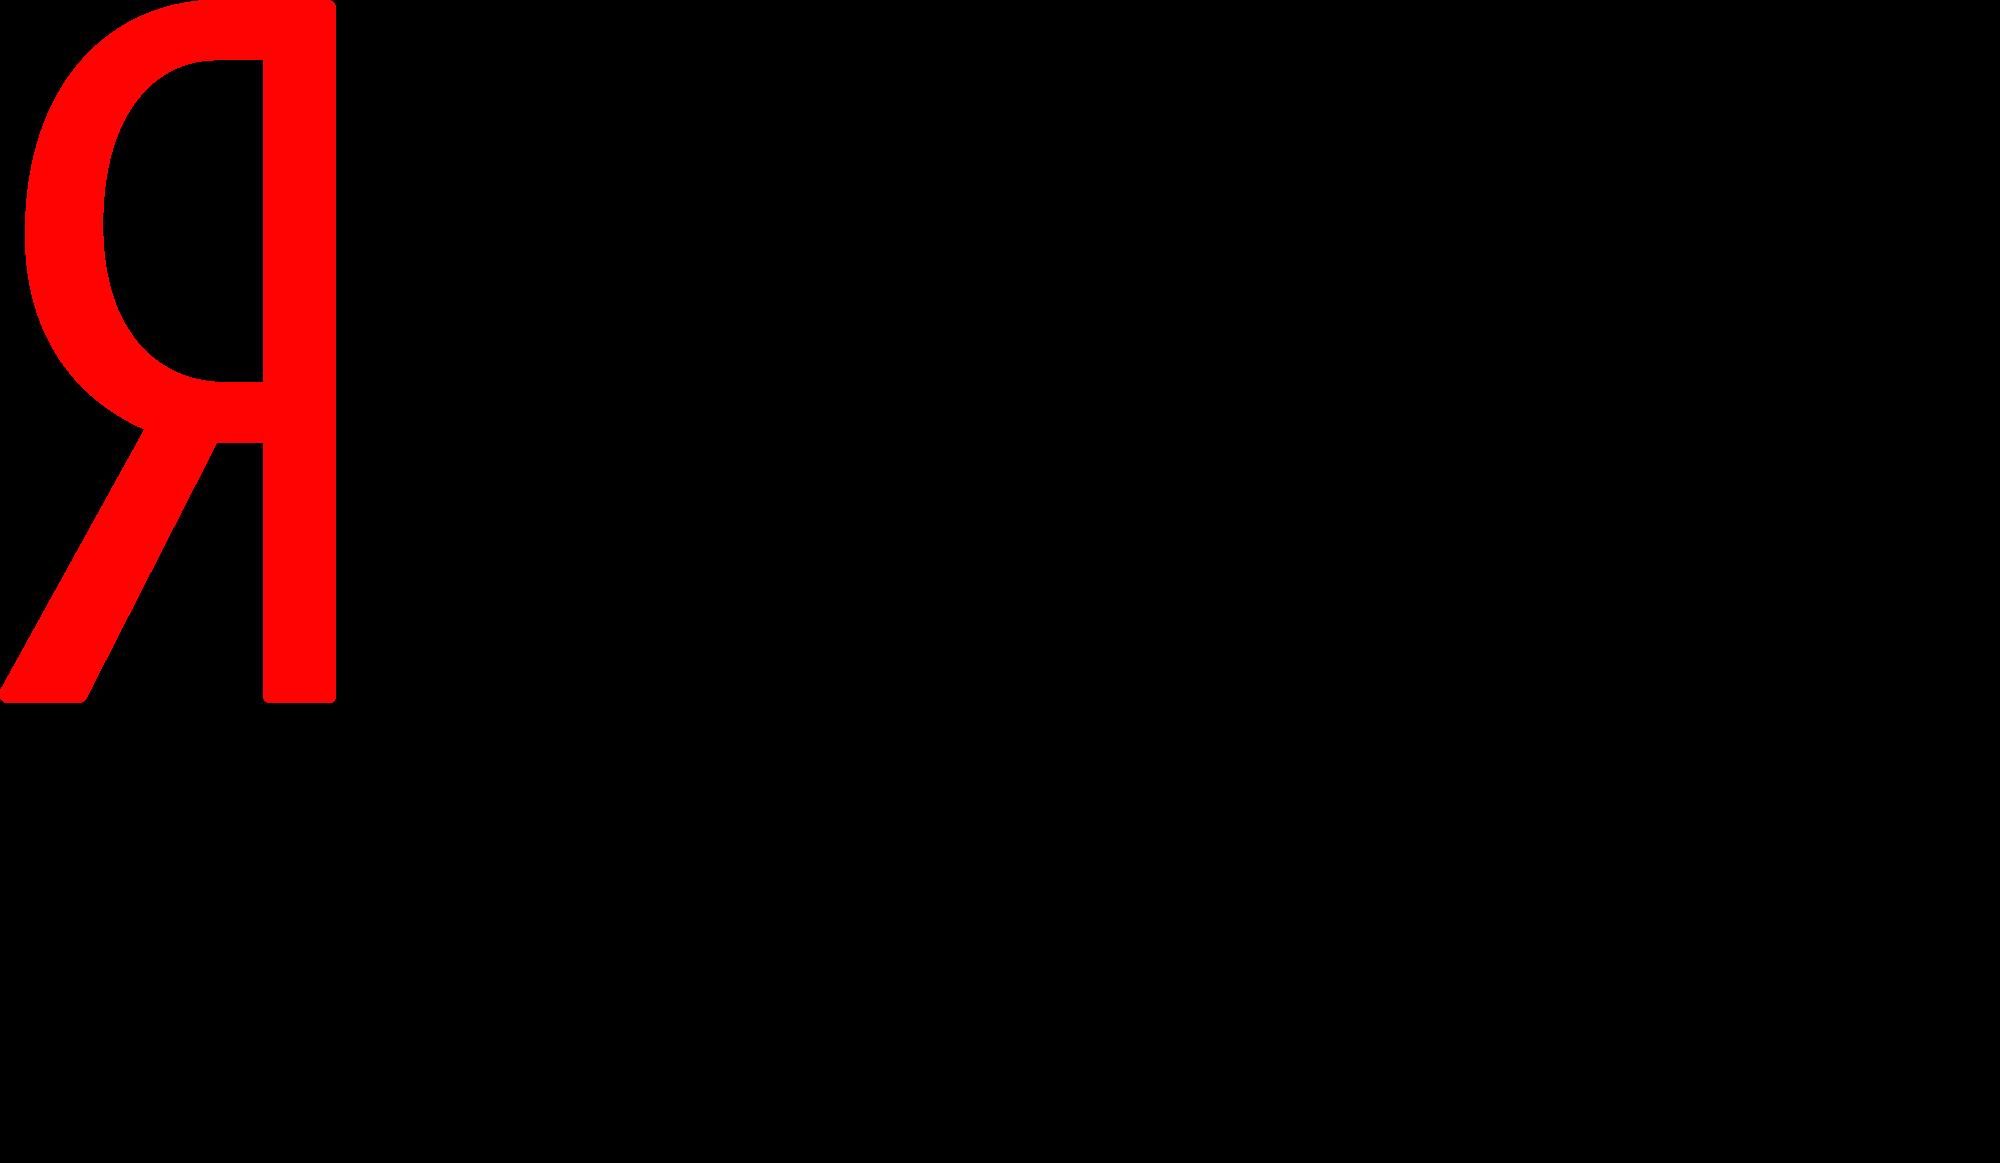 Yandex. Yandex logo - Yandex Logo PNG